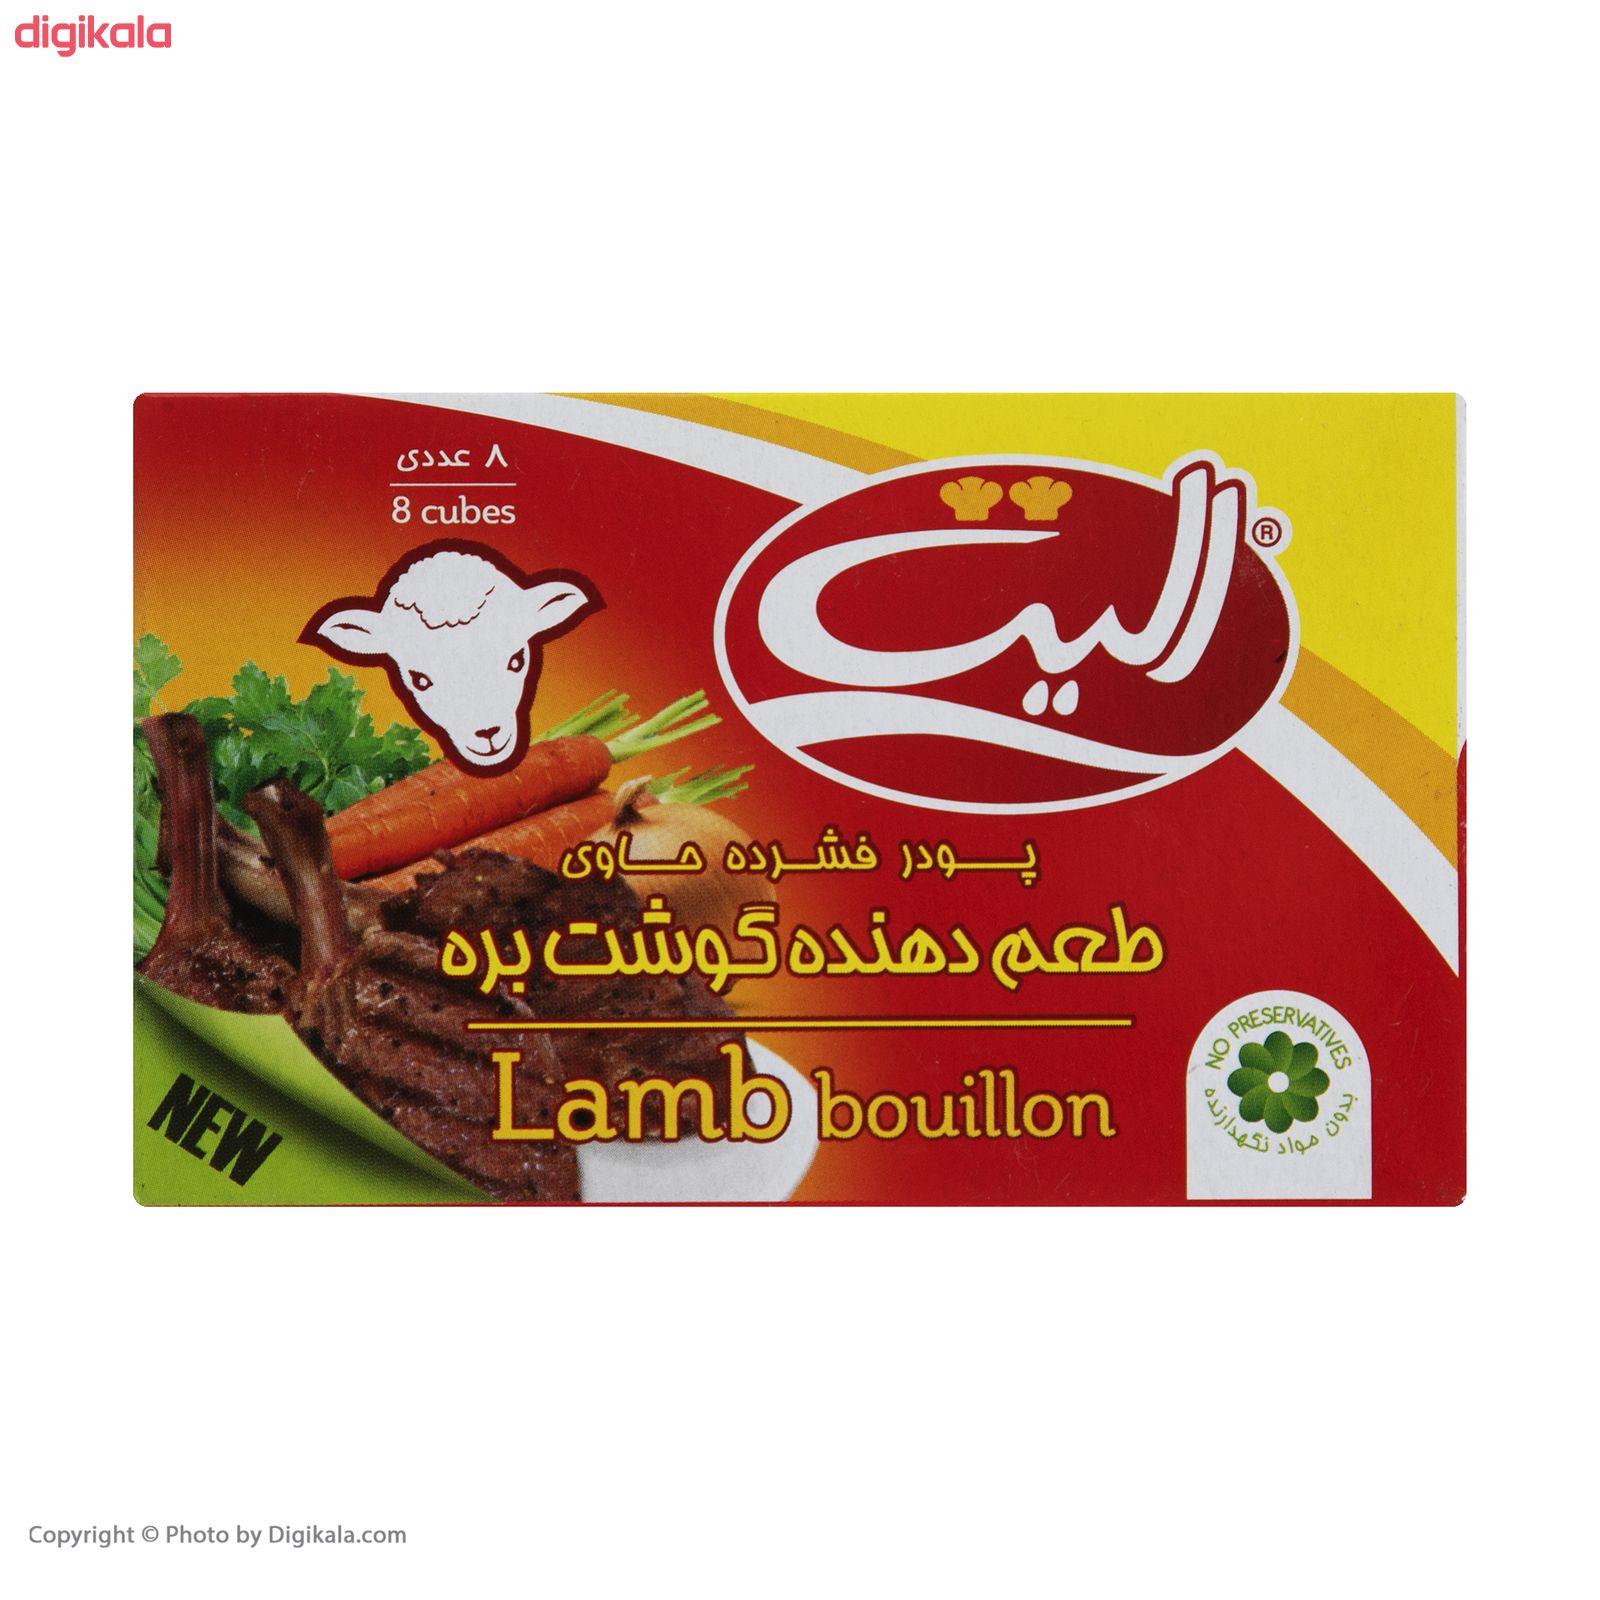 پودر عصاره گوشت بره الیت مقدار 80 گرم main 1 5